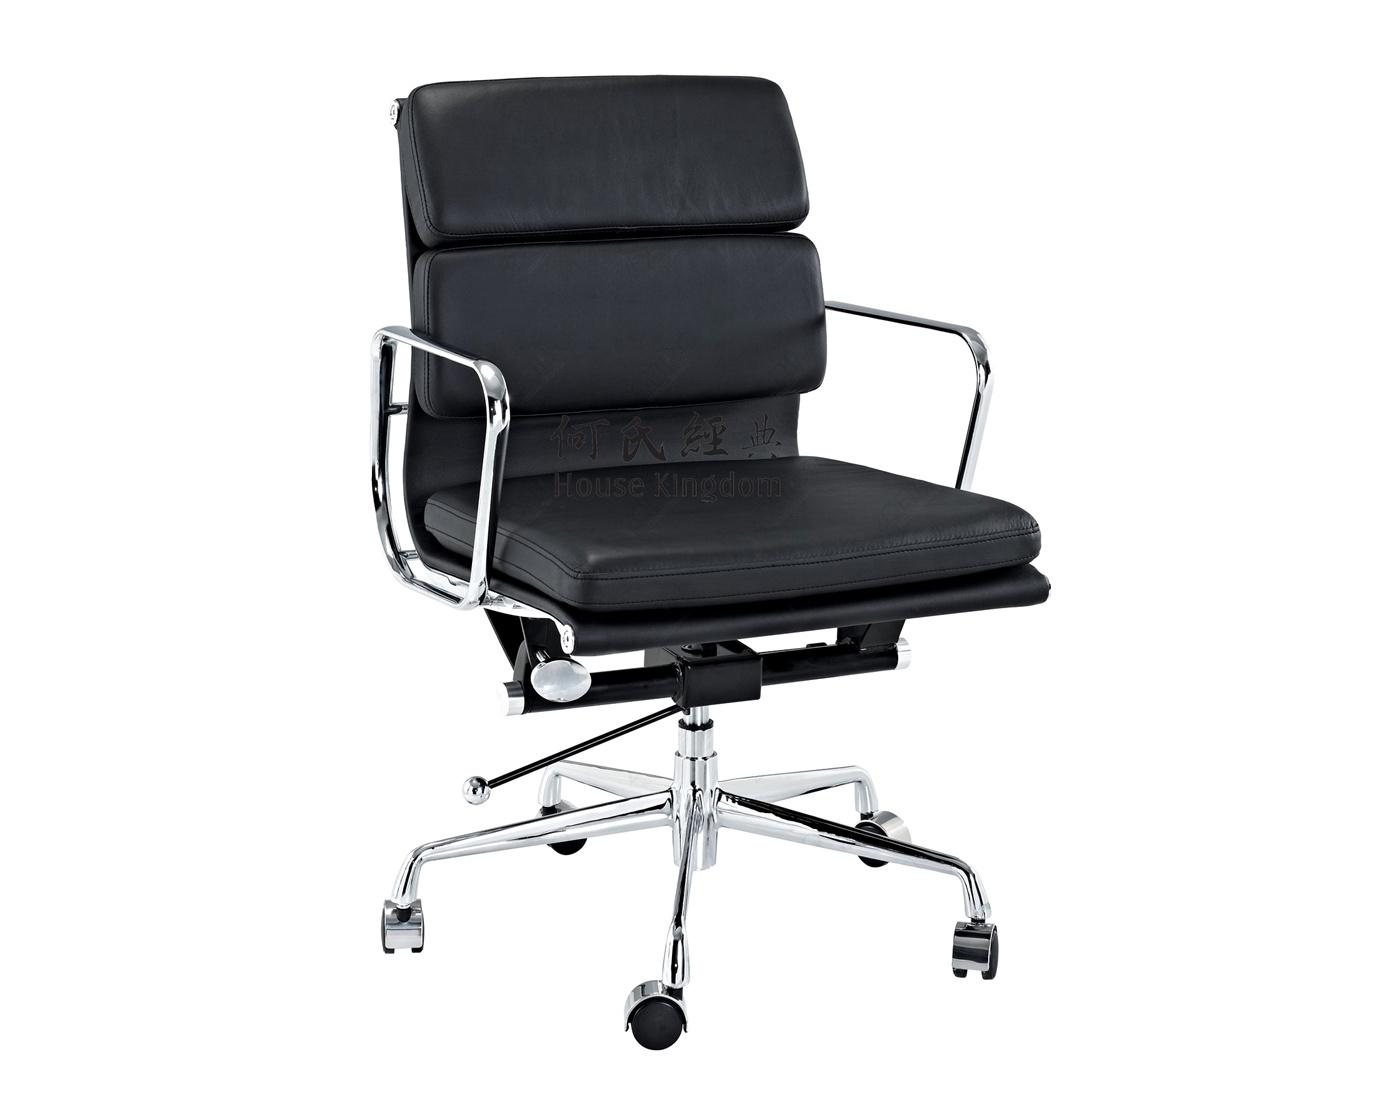 eames chaise de bureau Eames chaise de bureau EA217 u2013Eames chaise de bureau EA217 fournis par  Classic Furniture Group Limited pour les francophonies